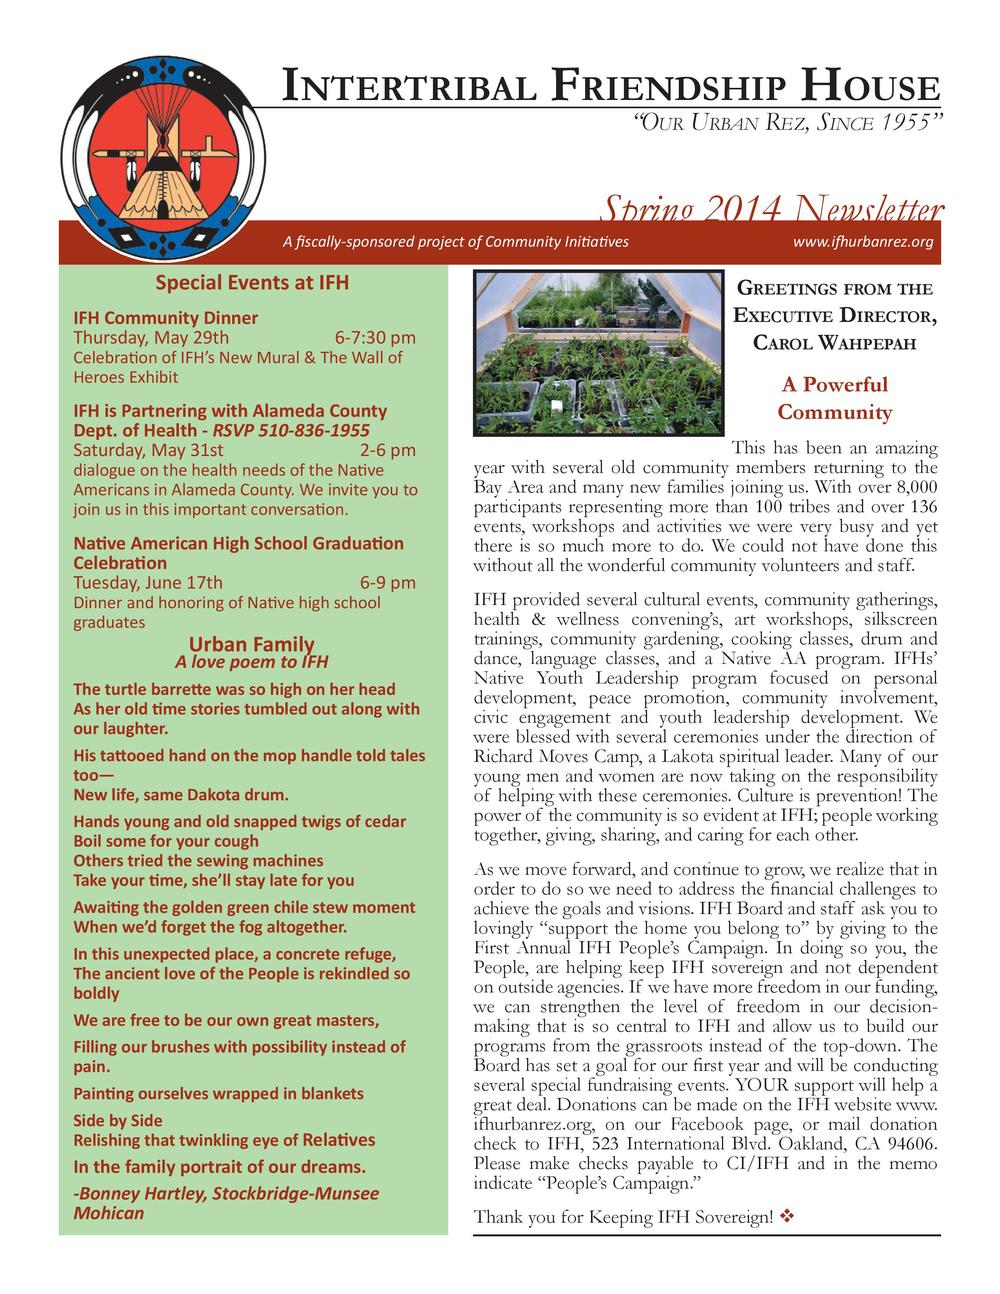 2014-05-08_newslttr-01 (3)-page-001.jpg